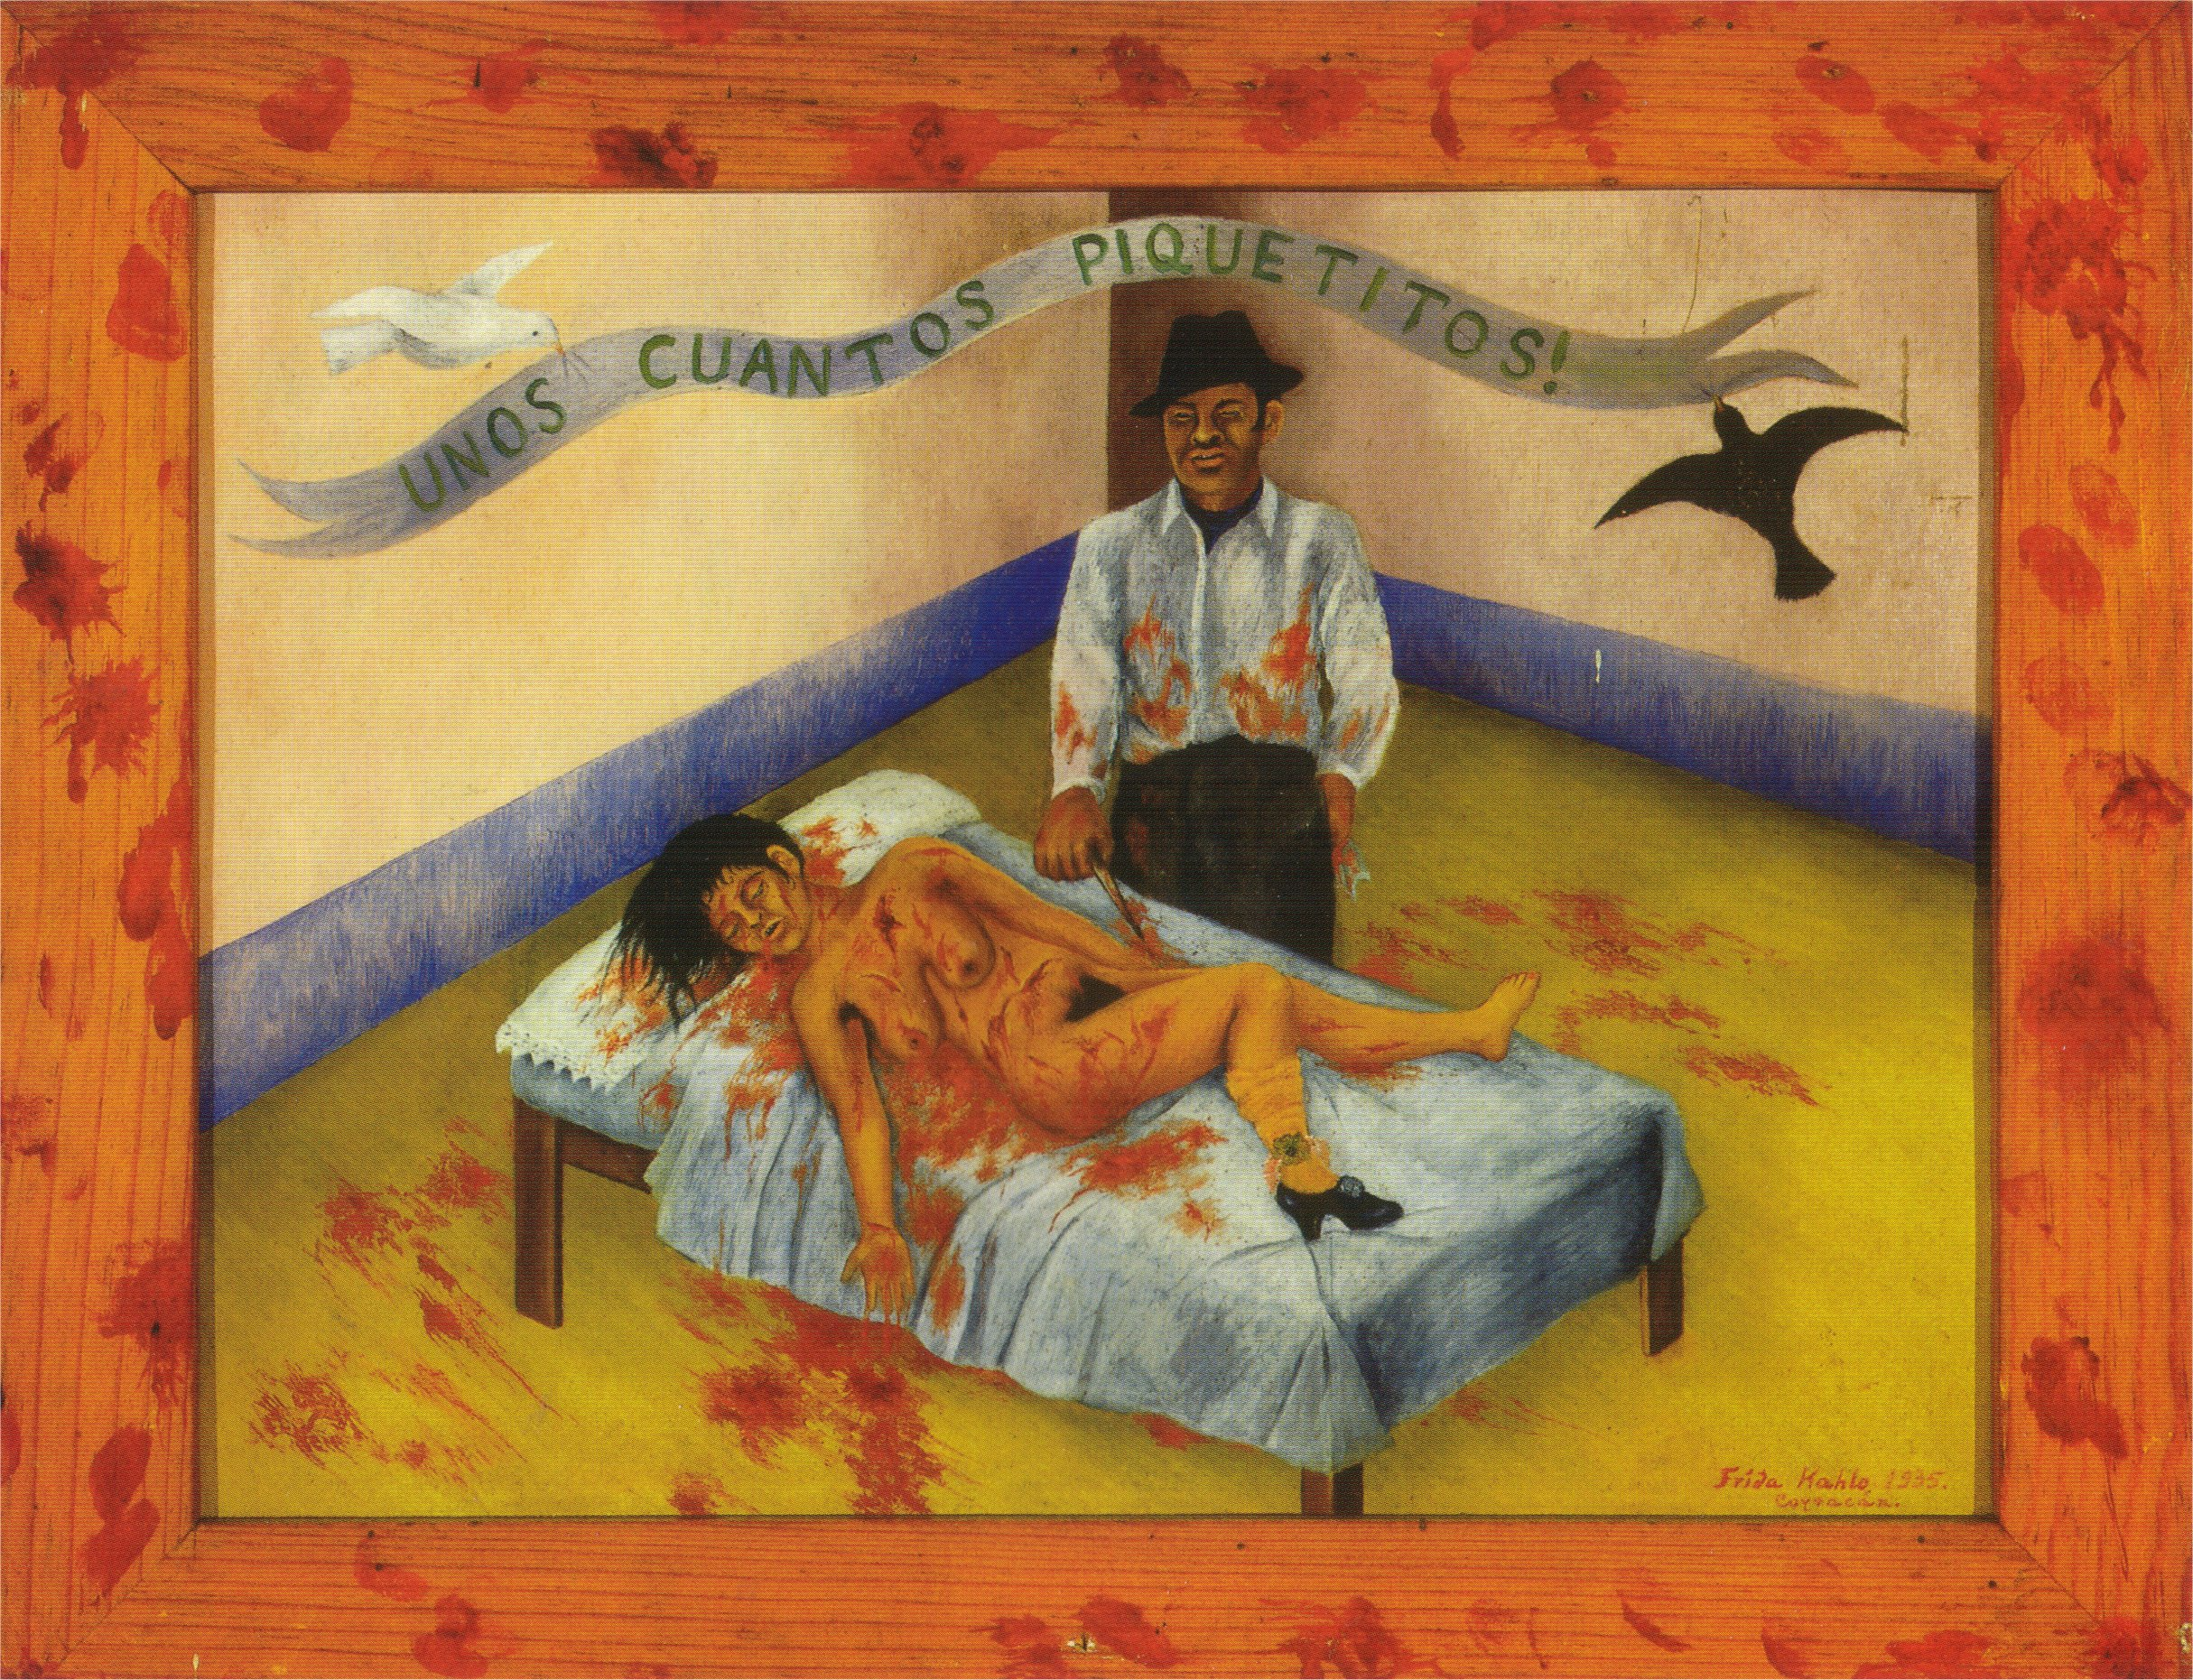 http://uploads0.wikiart.org/images/magdalena-carmen-frieda-kahlo-y-calder%C3%B3n-de-rivera/a-few-small-nips-passionately-in-love-1935.jpg